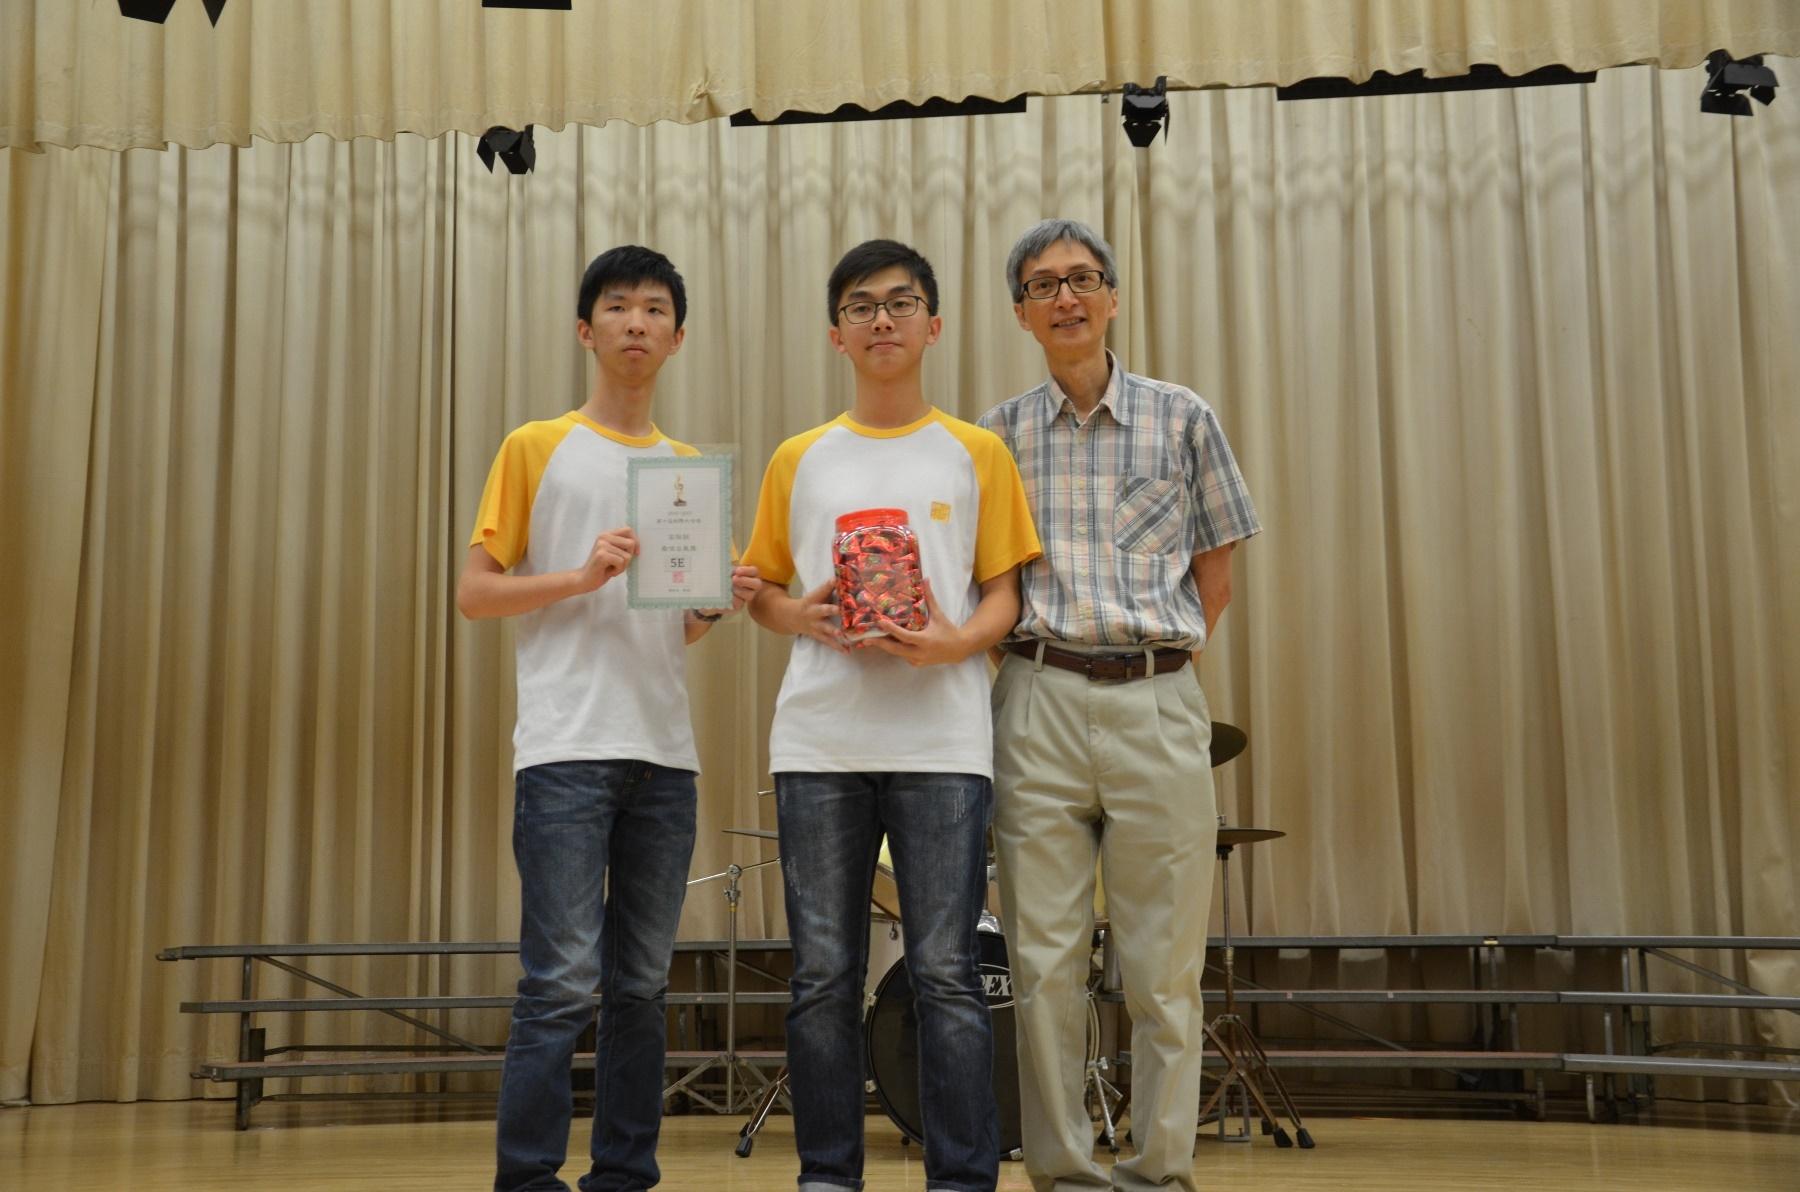 http://www.npc.edu.hk/sites/default/files/dsc_7617.jpg